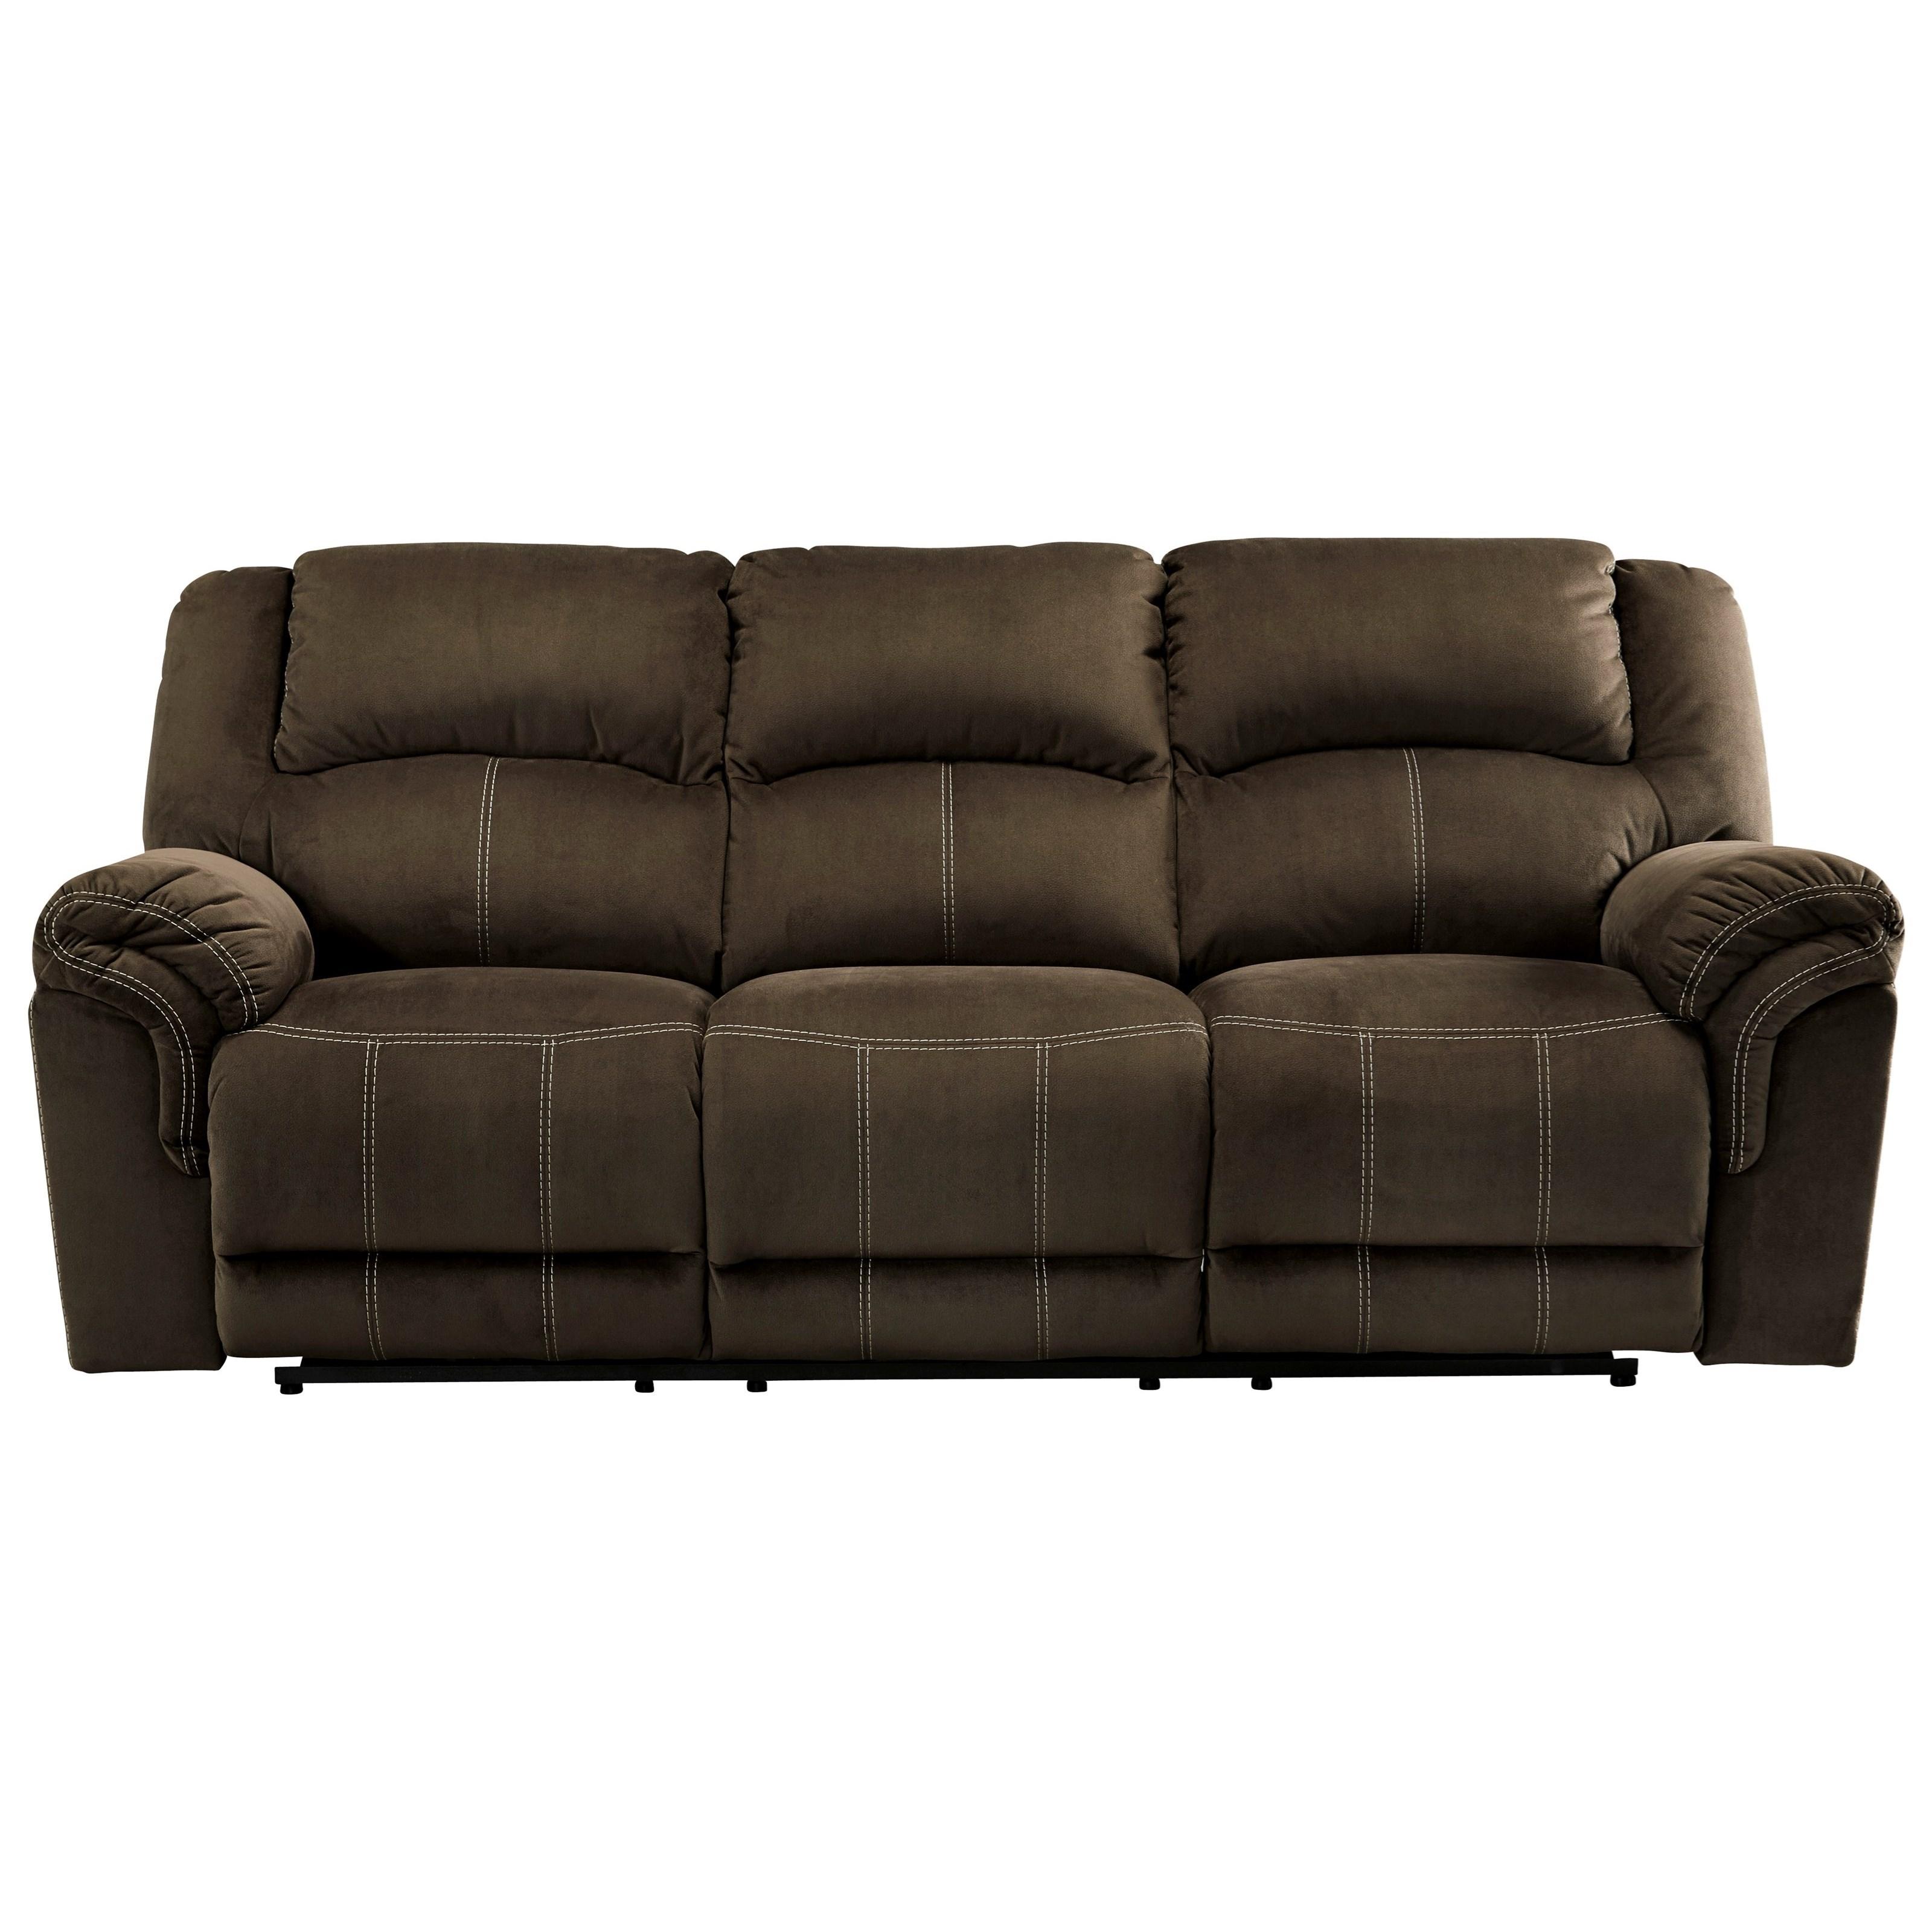 Signature Design By Ashley Quinnlyn 9570187 Reclining Power Sofa Lapeer Furniture Mattress